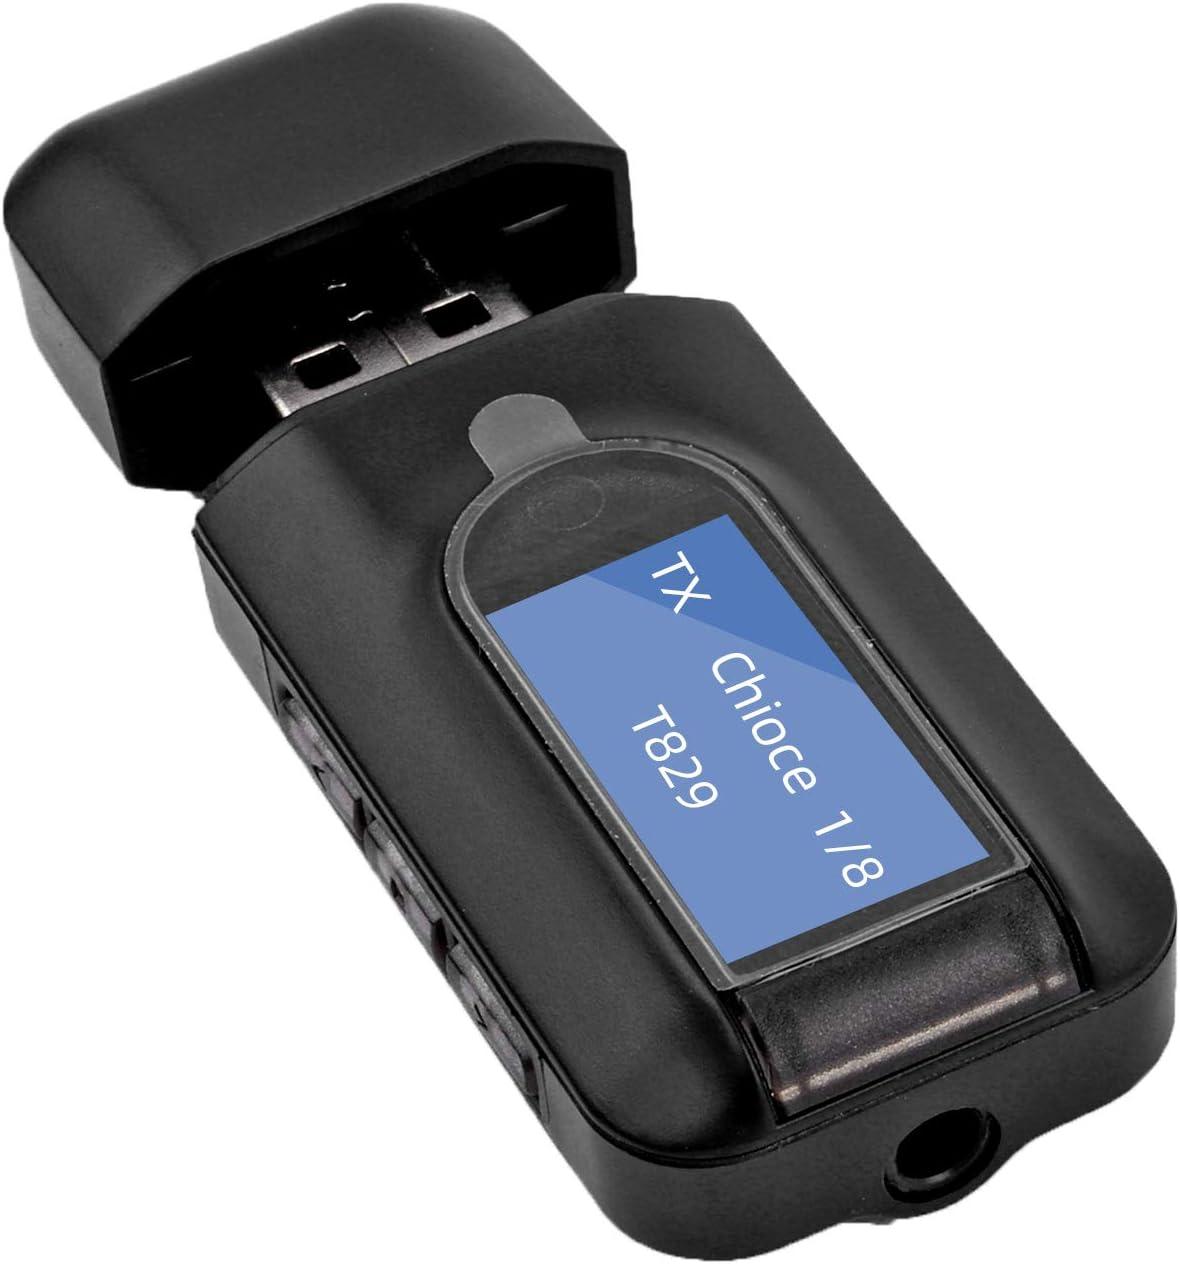 Bluetooth-Kopfh/örer,kabellose Touch-Kopfh/örer HiFi-Kopfh/örer In-Ear-Kopfh/örer Rauschunterdr/ückungskopfh/örer,Tragbare Sport-Bluetooth-Funkkopfh/örer,F/ür Android//iPhone//Samsung//A-irPods Pro